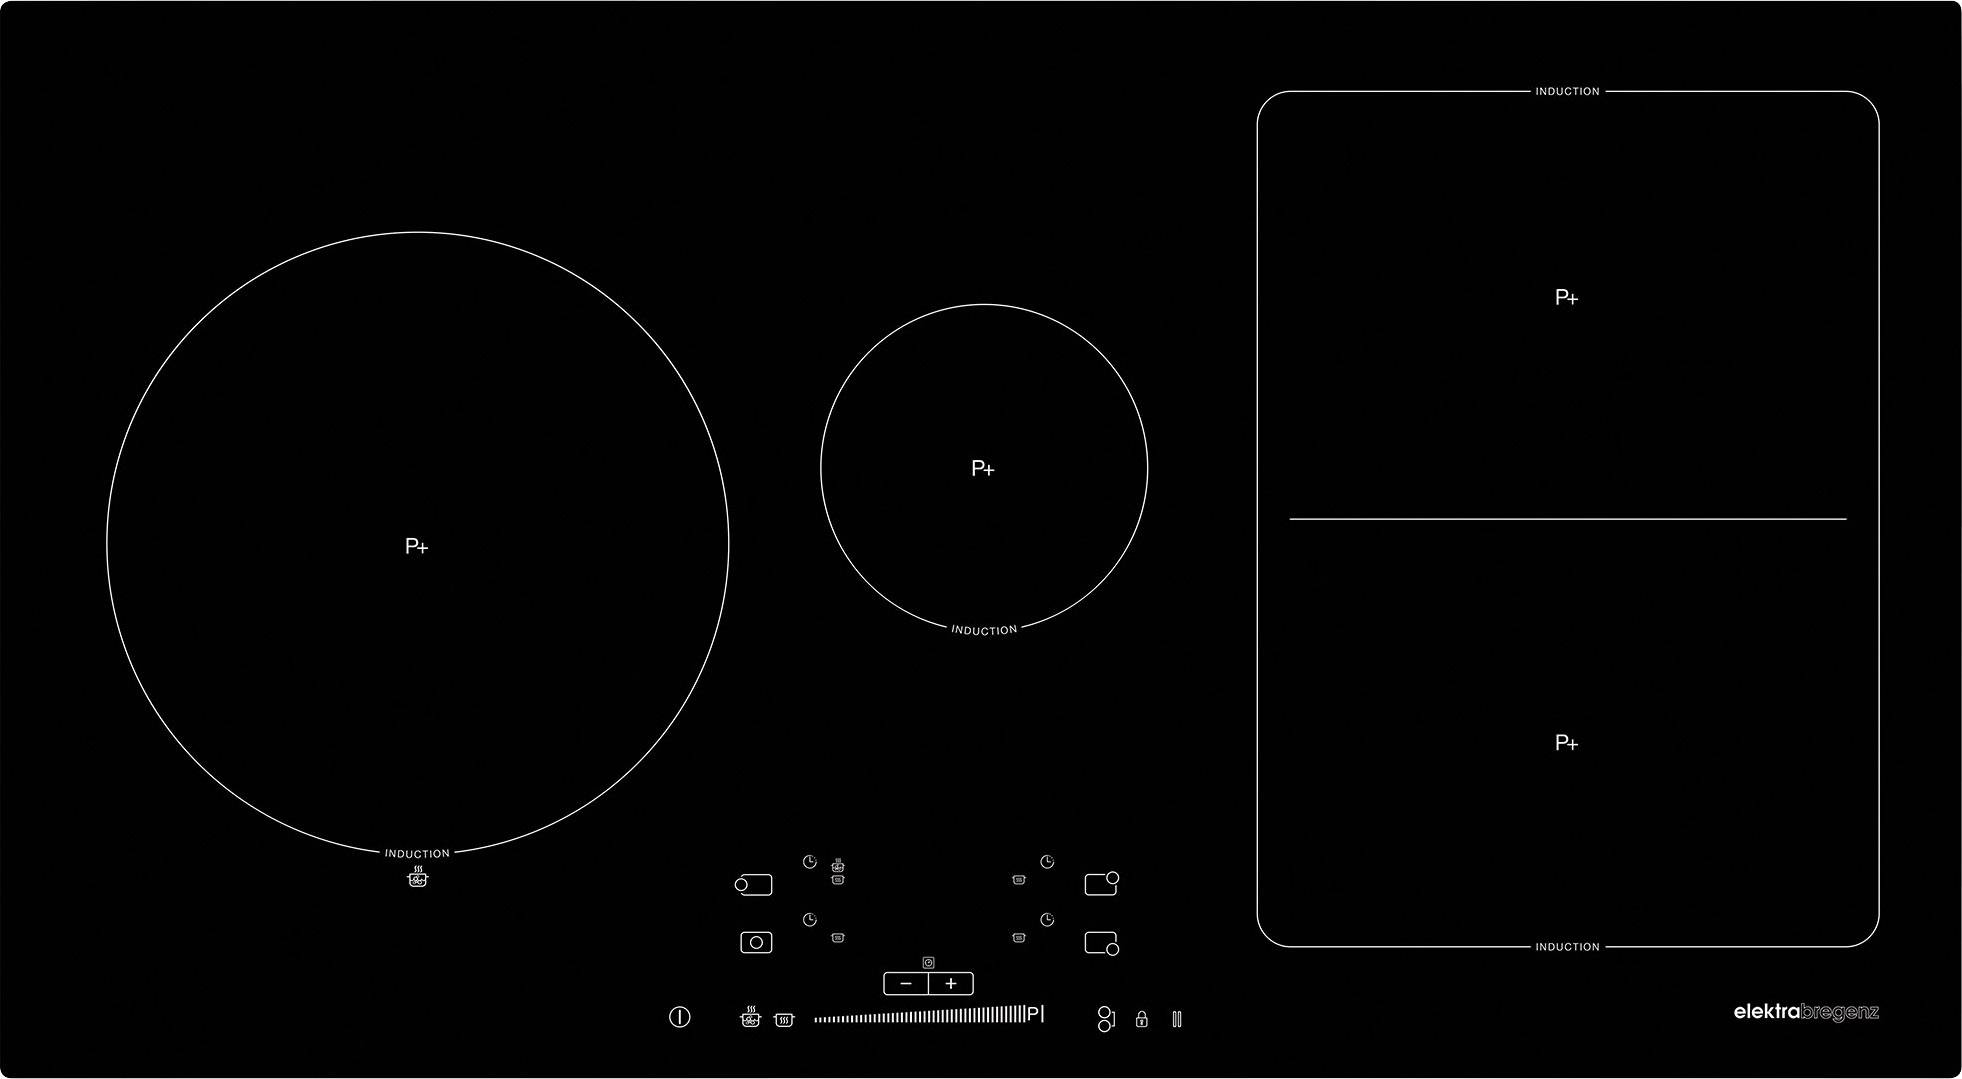 autark kochfeld top eki ec induktion autark zustand with. Black Bedroom Furniture Sets. Home Design Ideas